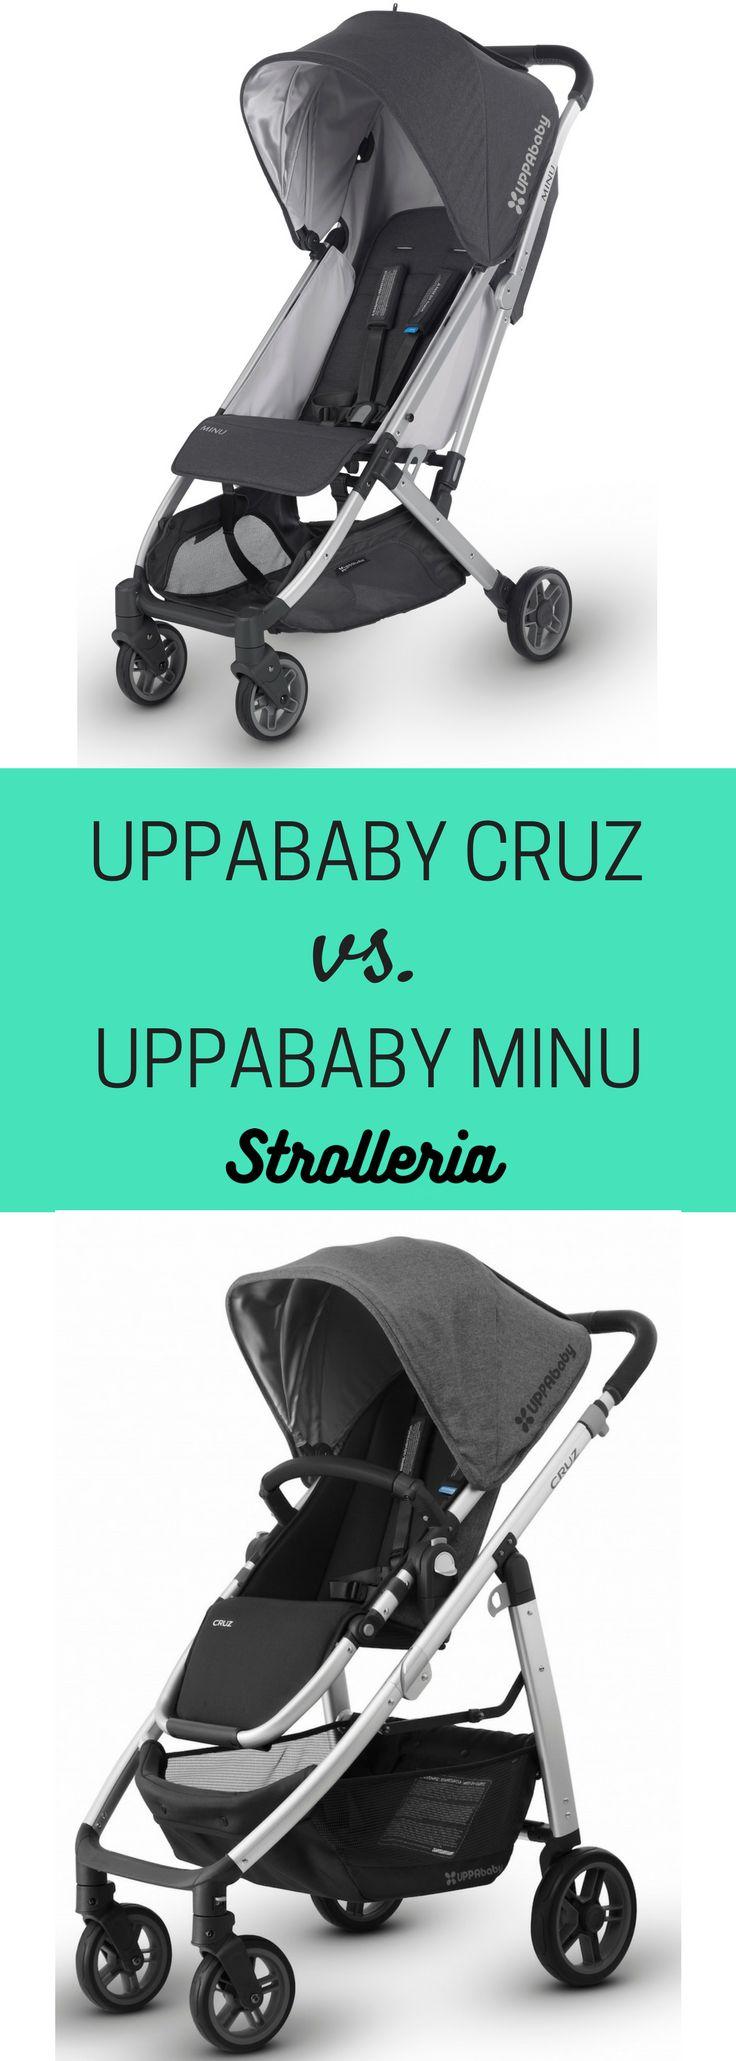 UPPAbaby CRUZ vs. UPPAbaby MINU Stroller Comparison